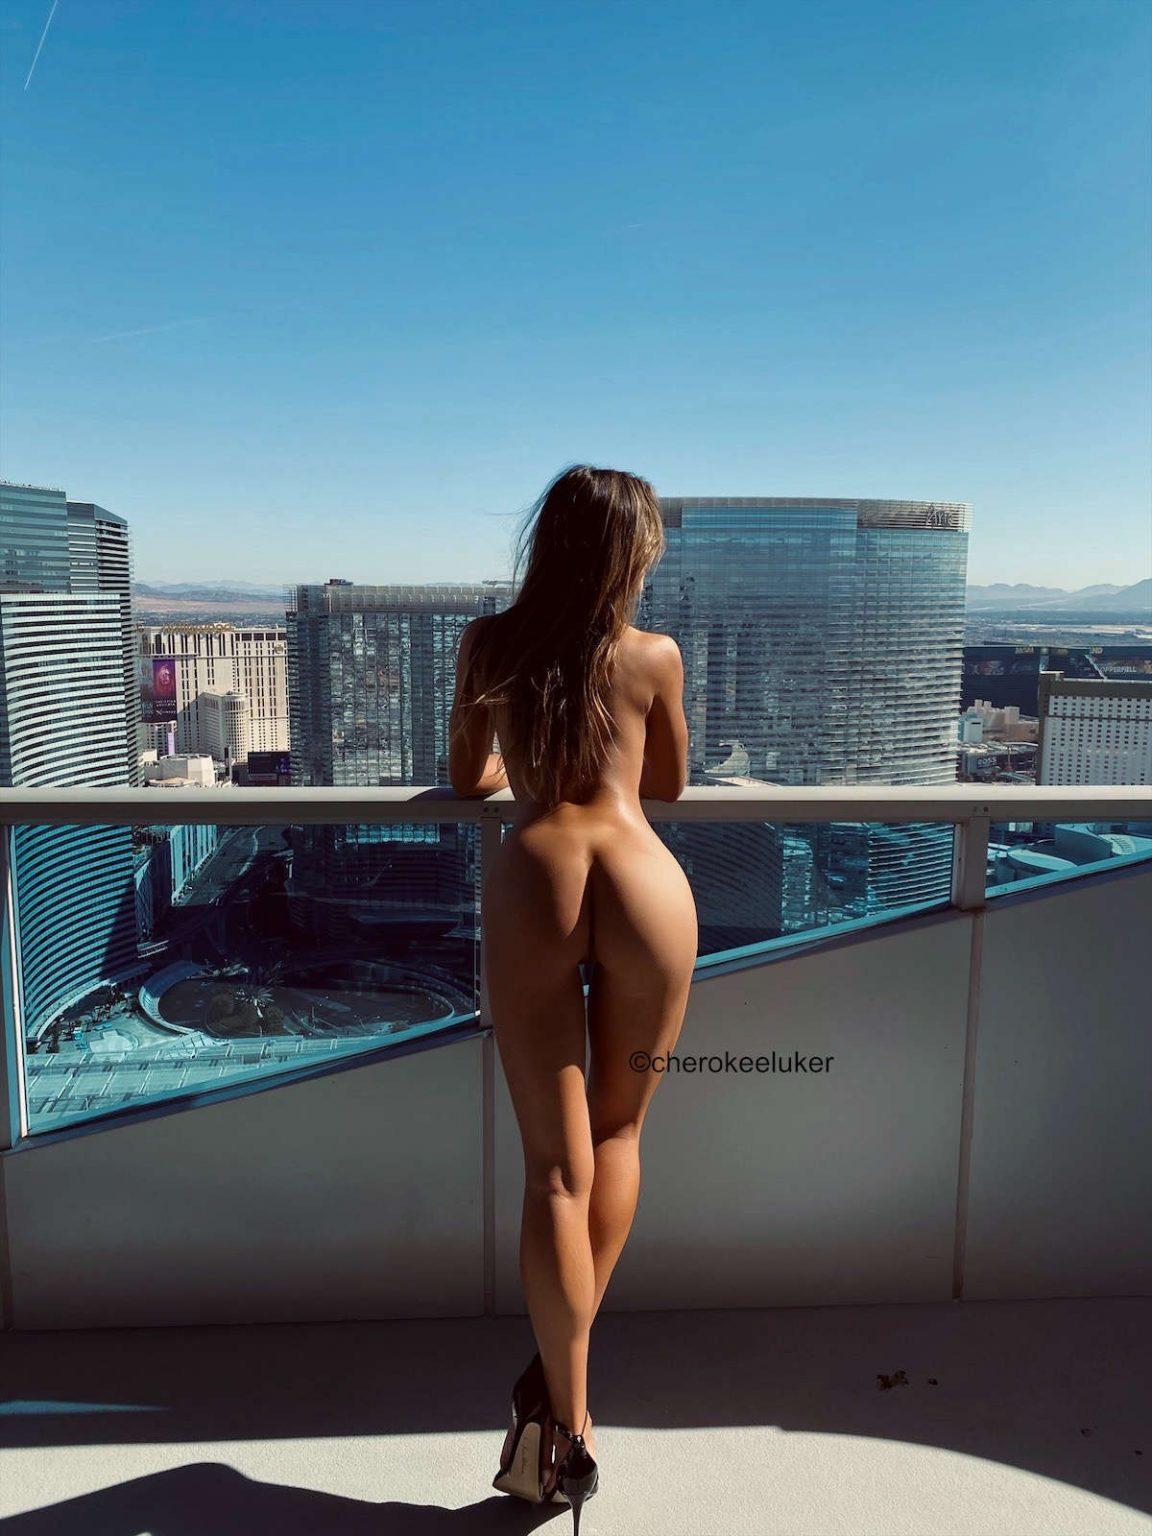 Fit-Naked-Girls-com-Cherokee-Luker-nude-fit-20-1152x1536